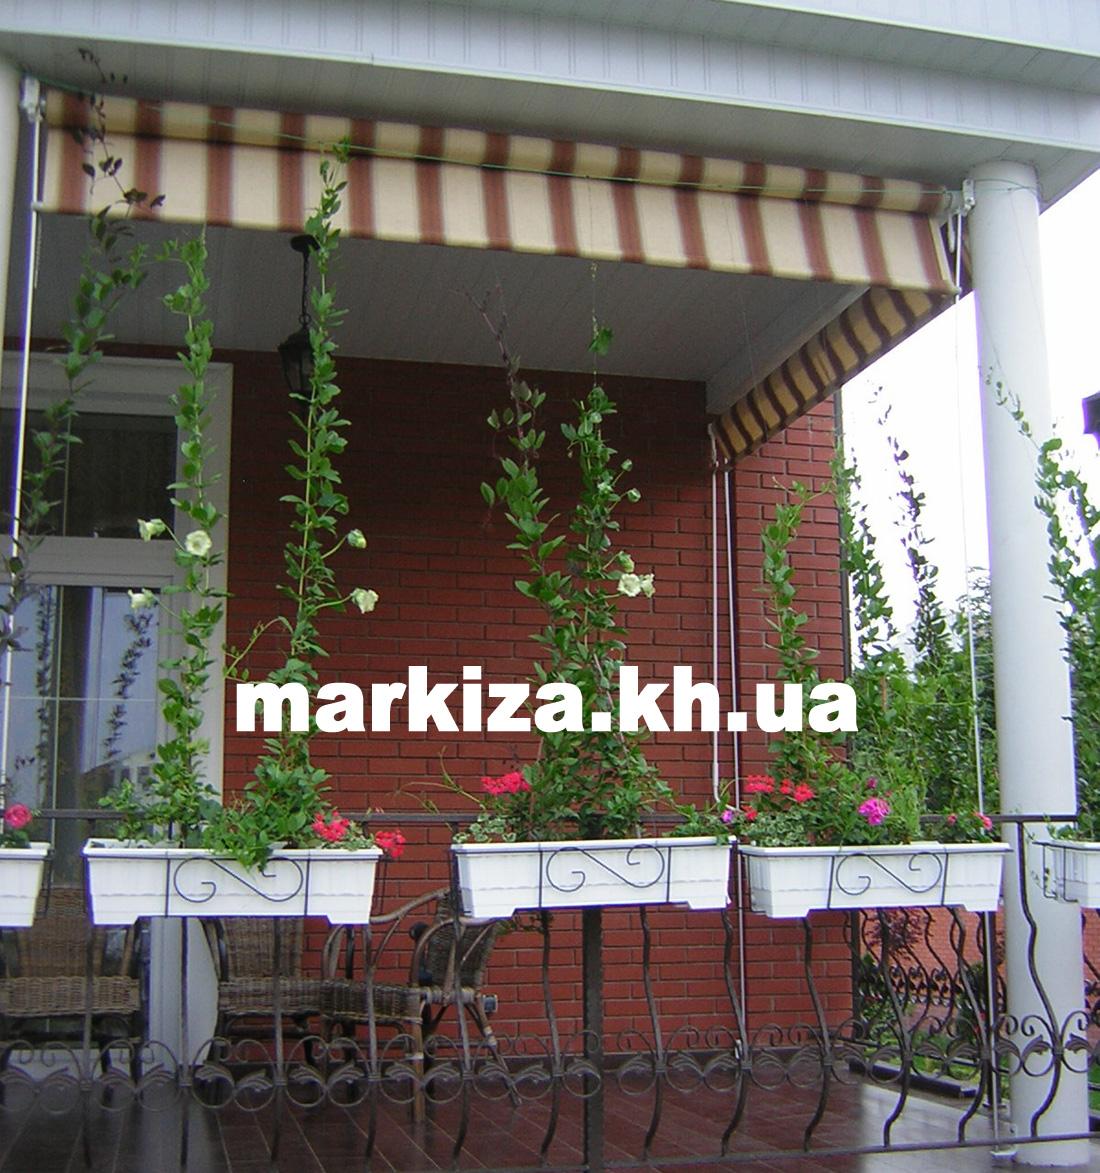 markiza-harkov-vertikalnaya-rolleta-tkanevaya-sh